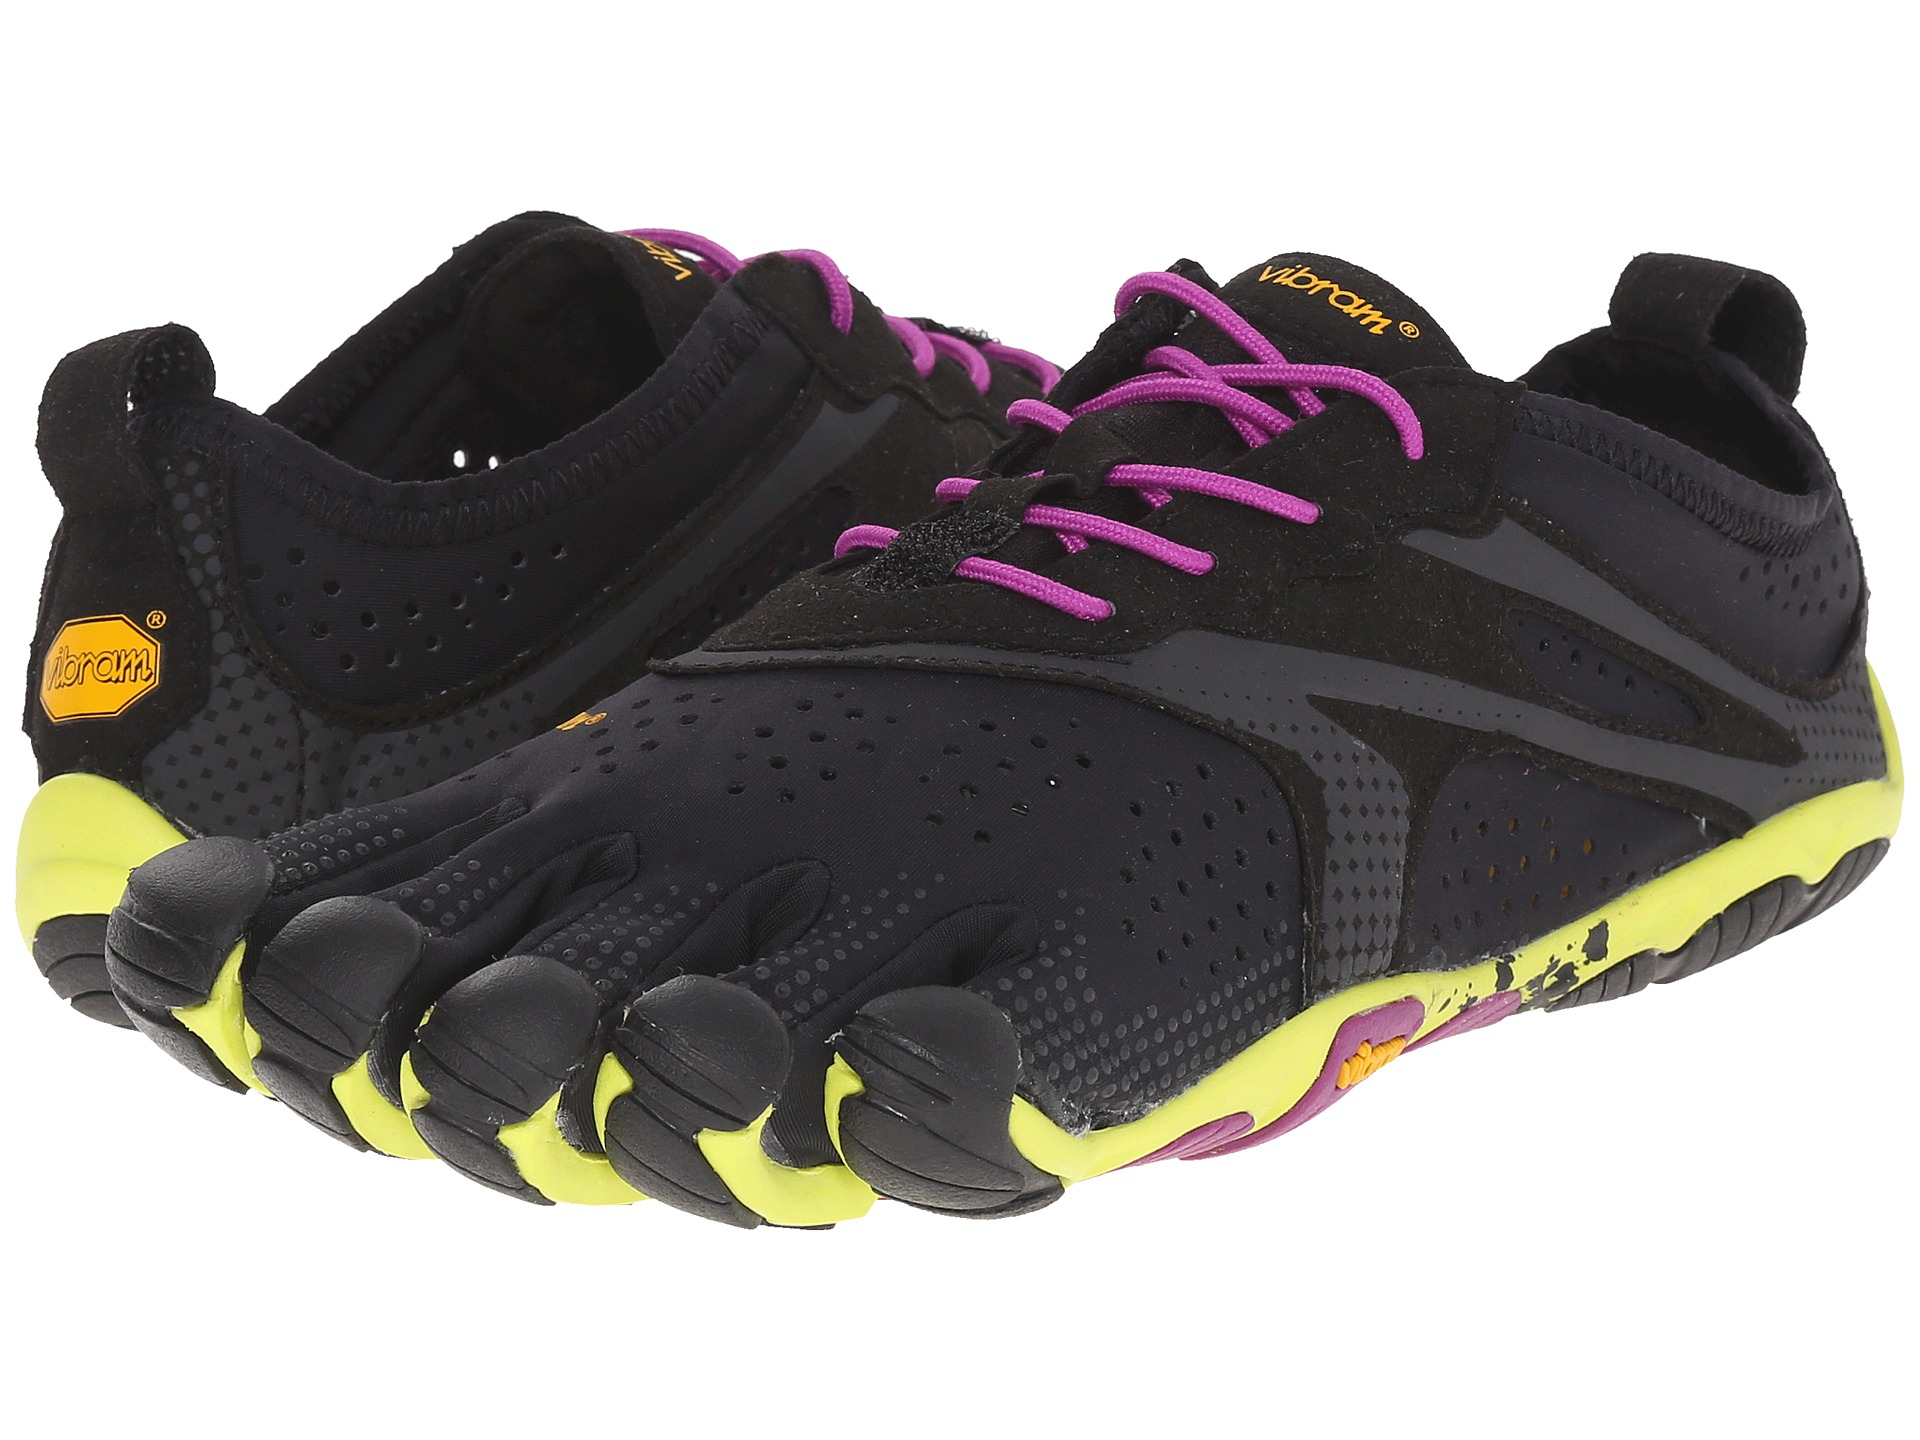 vibram fivefingers treksport yellow purple